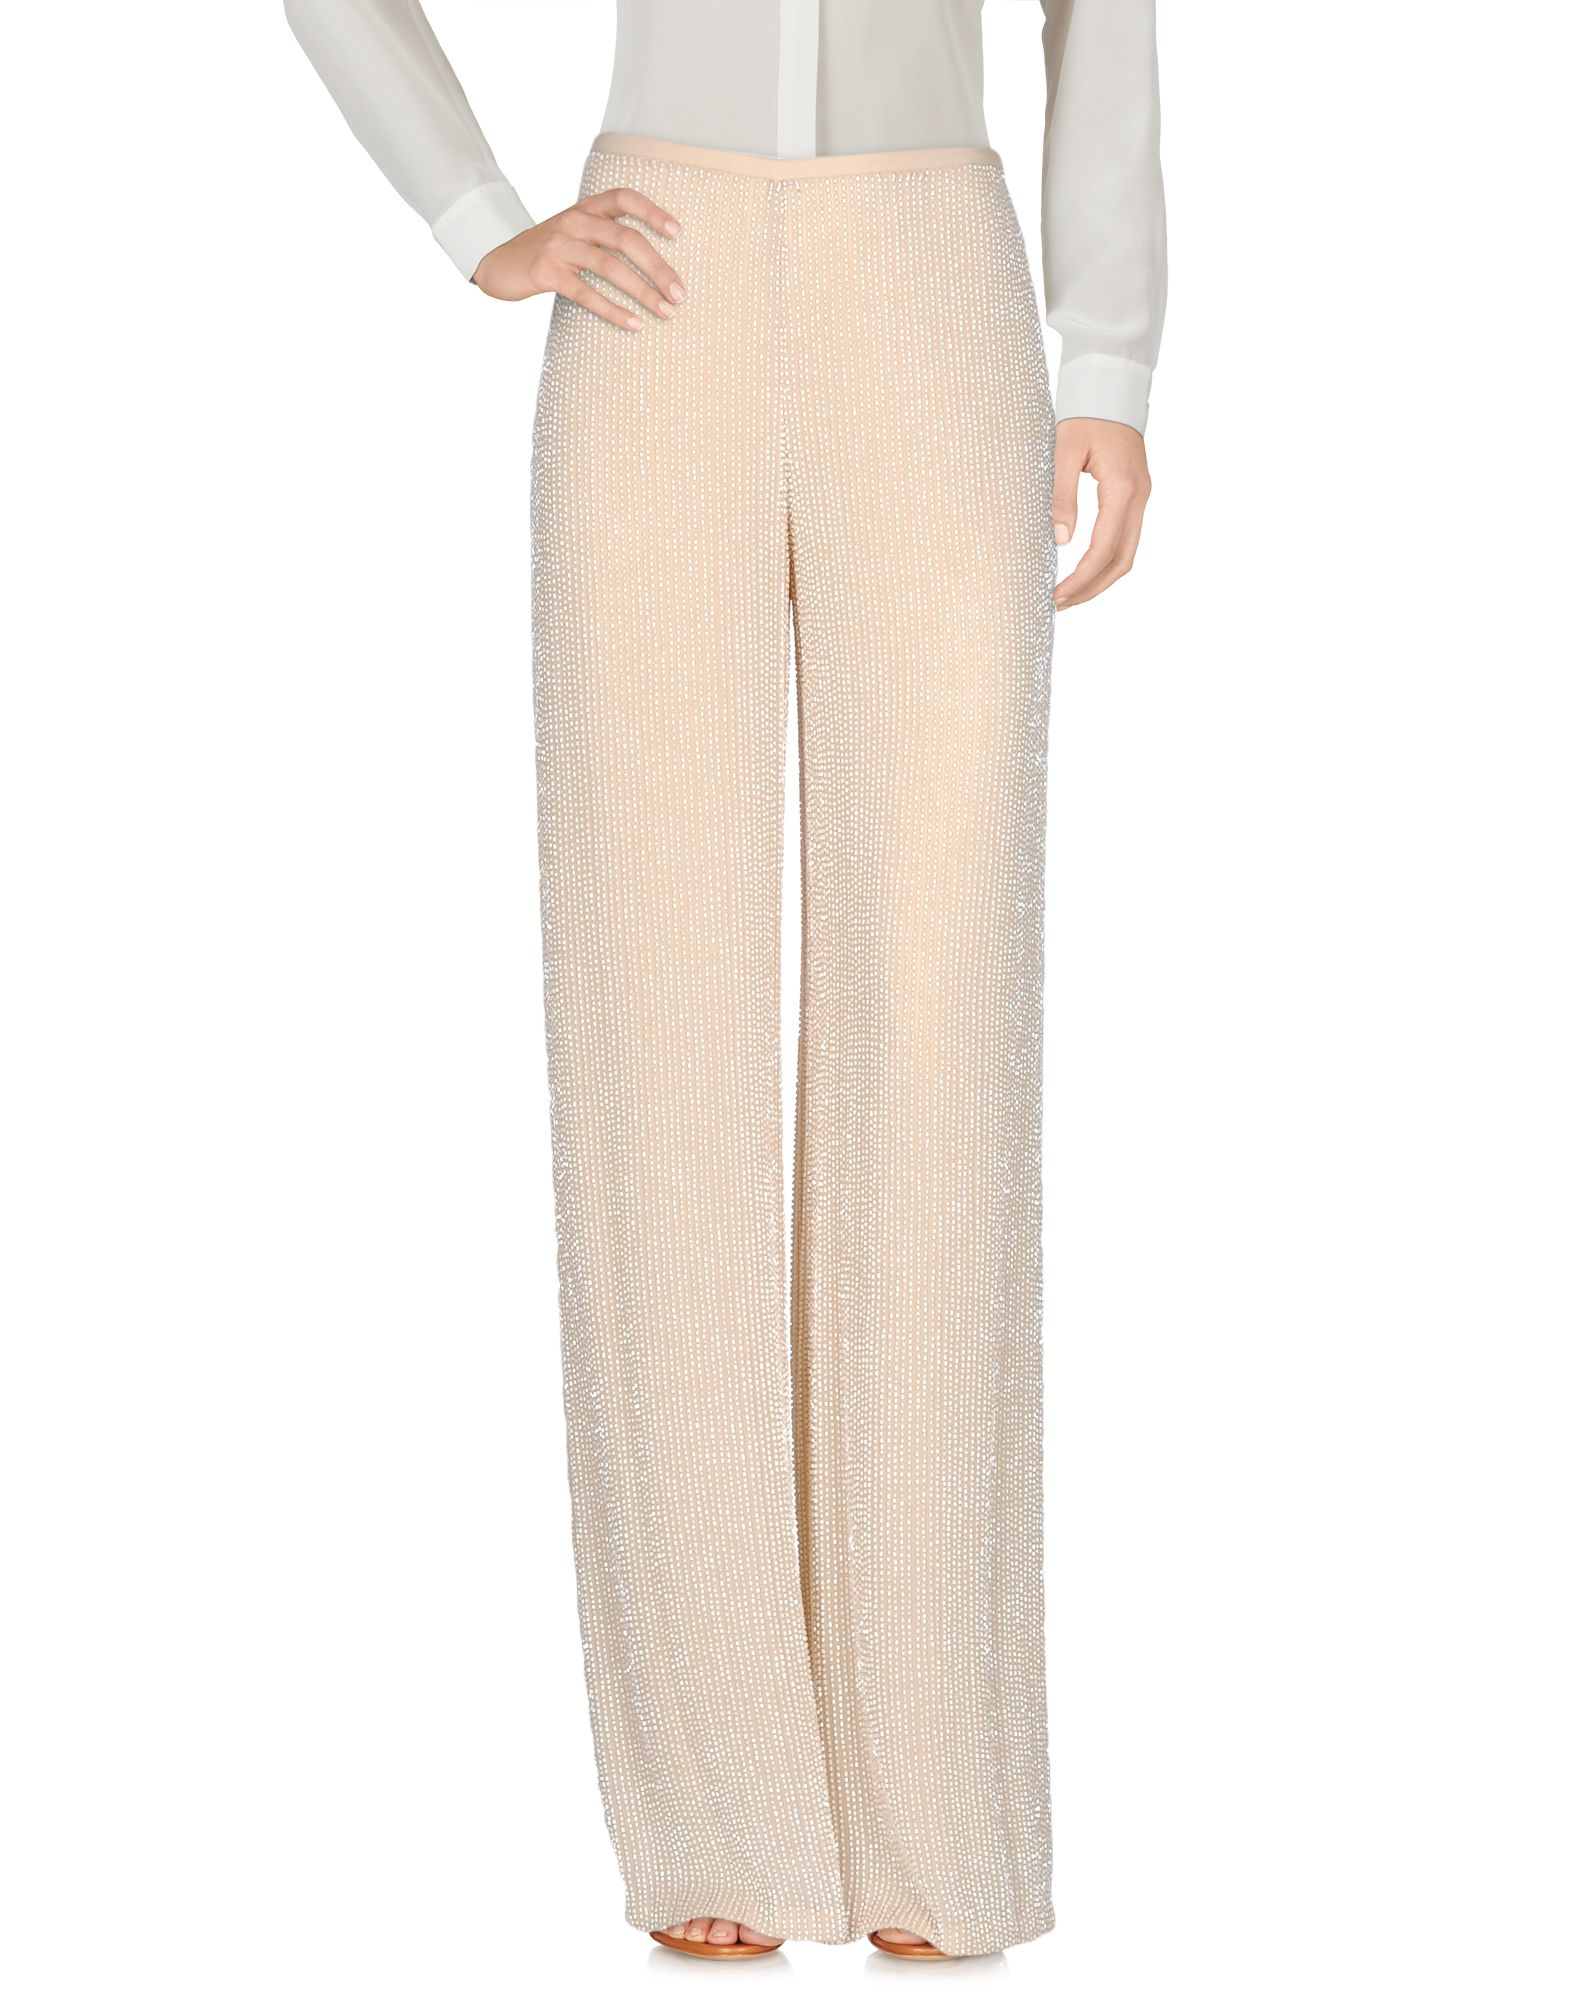 ARMANI COLLEZIONI Damen Hose Farbe Beige Größe 3